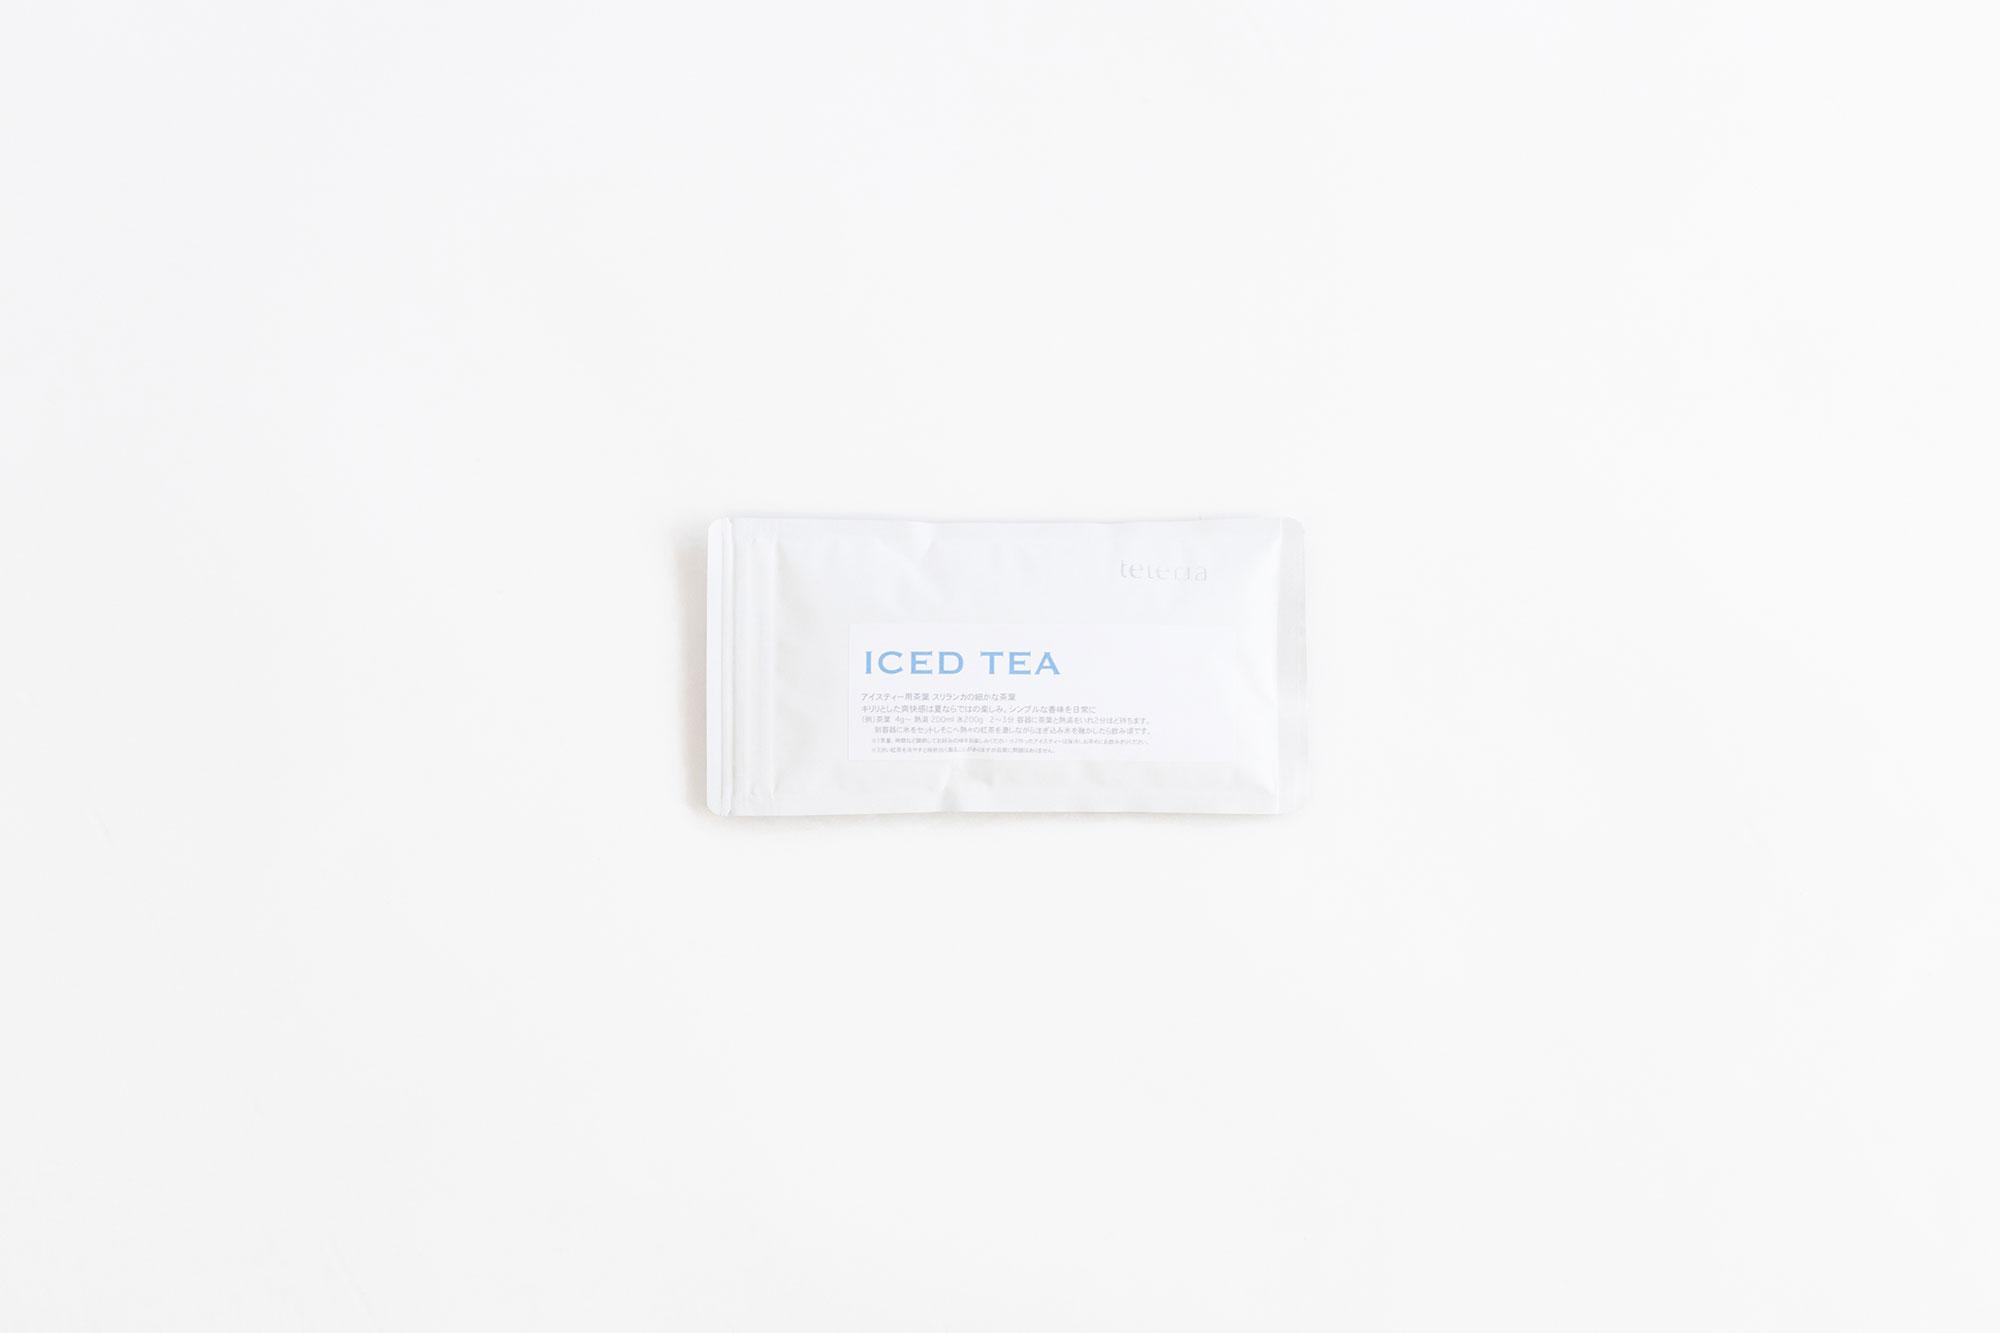 teteria ICED TEA 70g